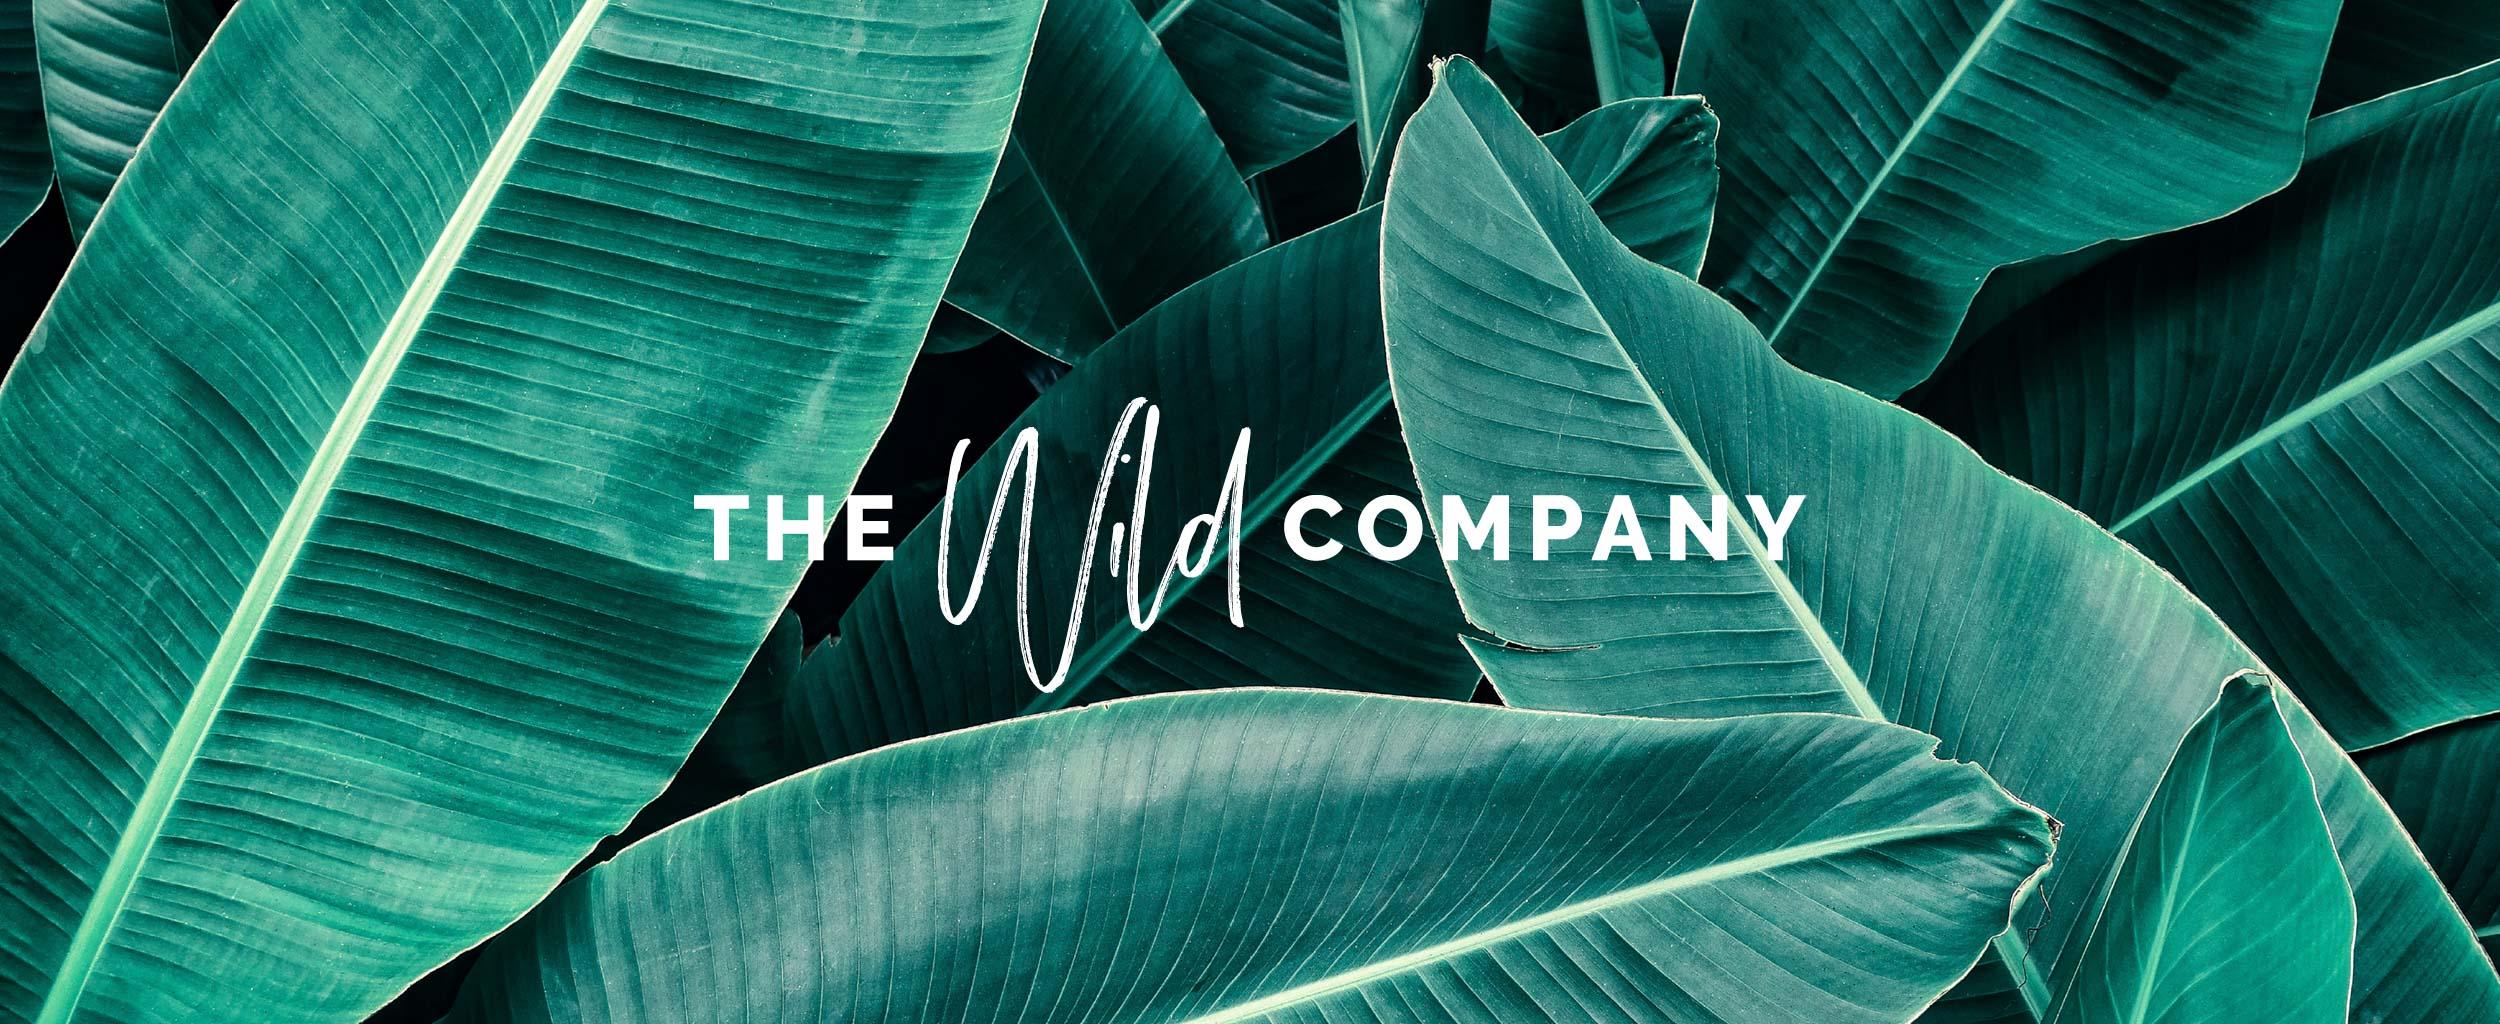 The_Wild_Company_Branding_03.jpg